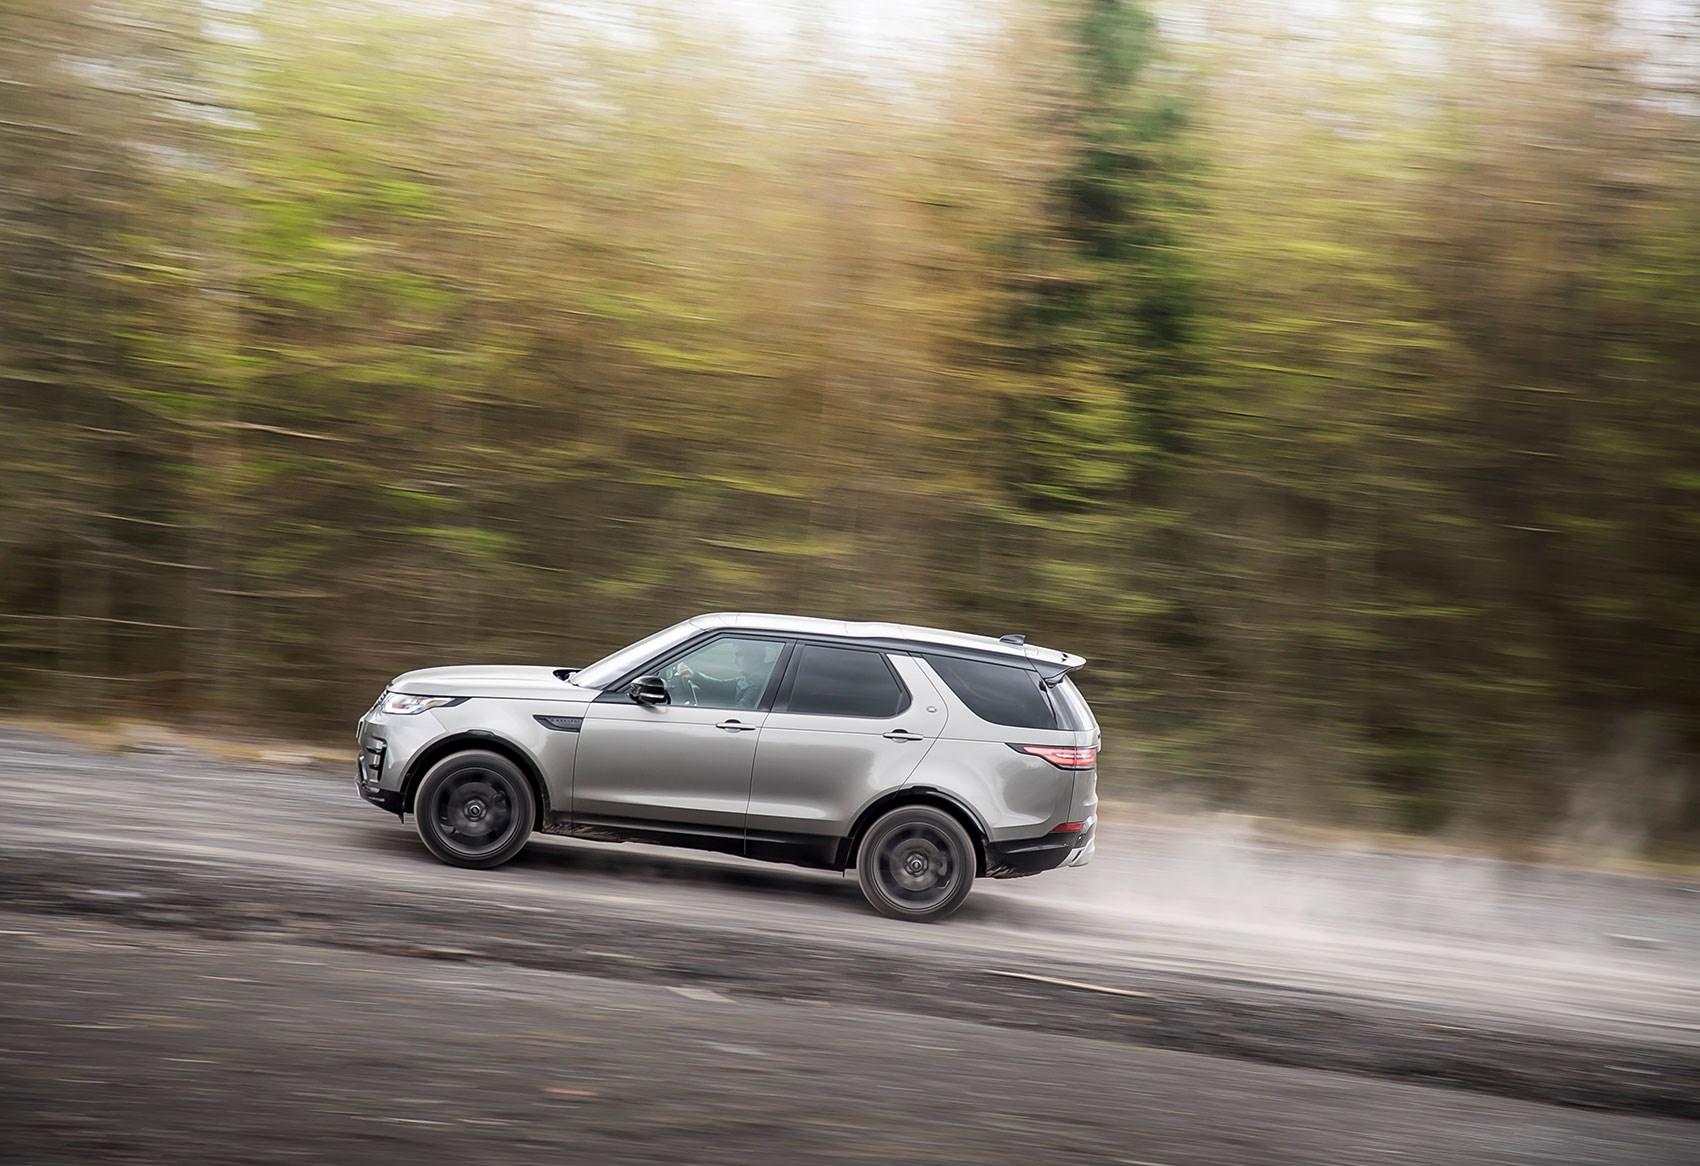 Land Rover Discovery Vs Audi Q Vs BMW X Vs Volvo XC Comparison - Audi q5 vs bmw x5